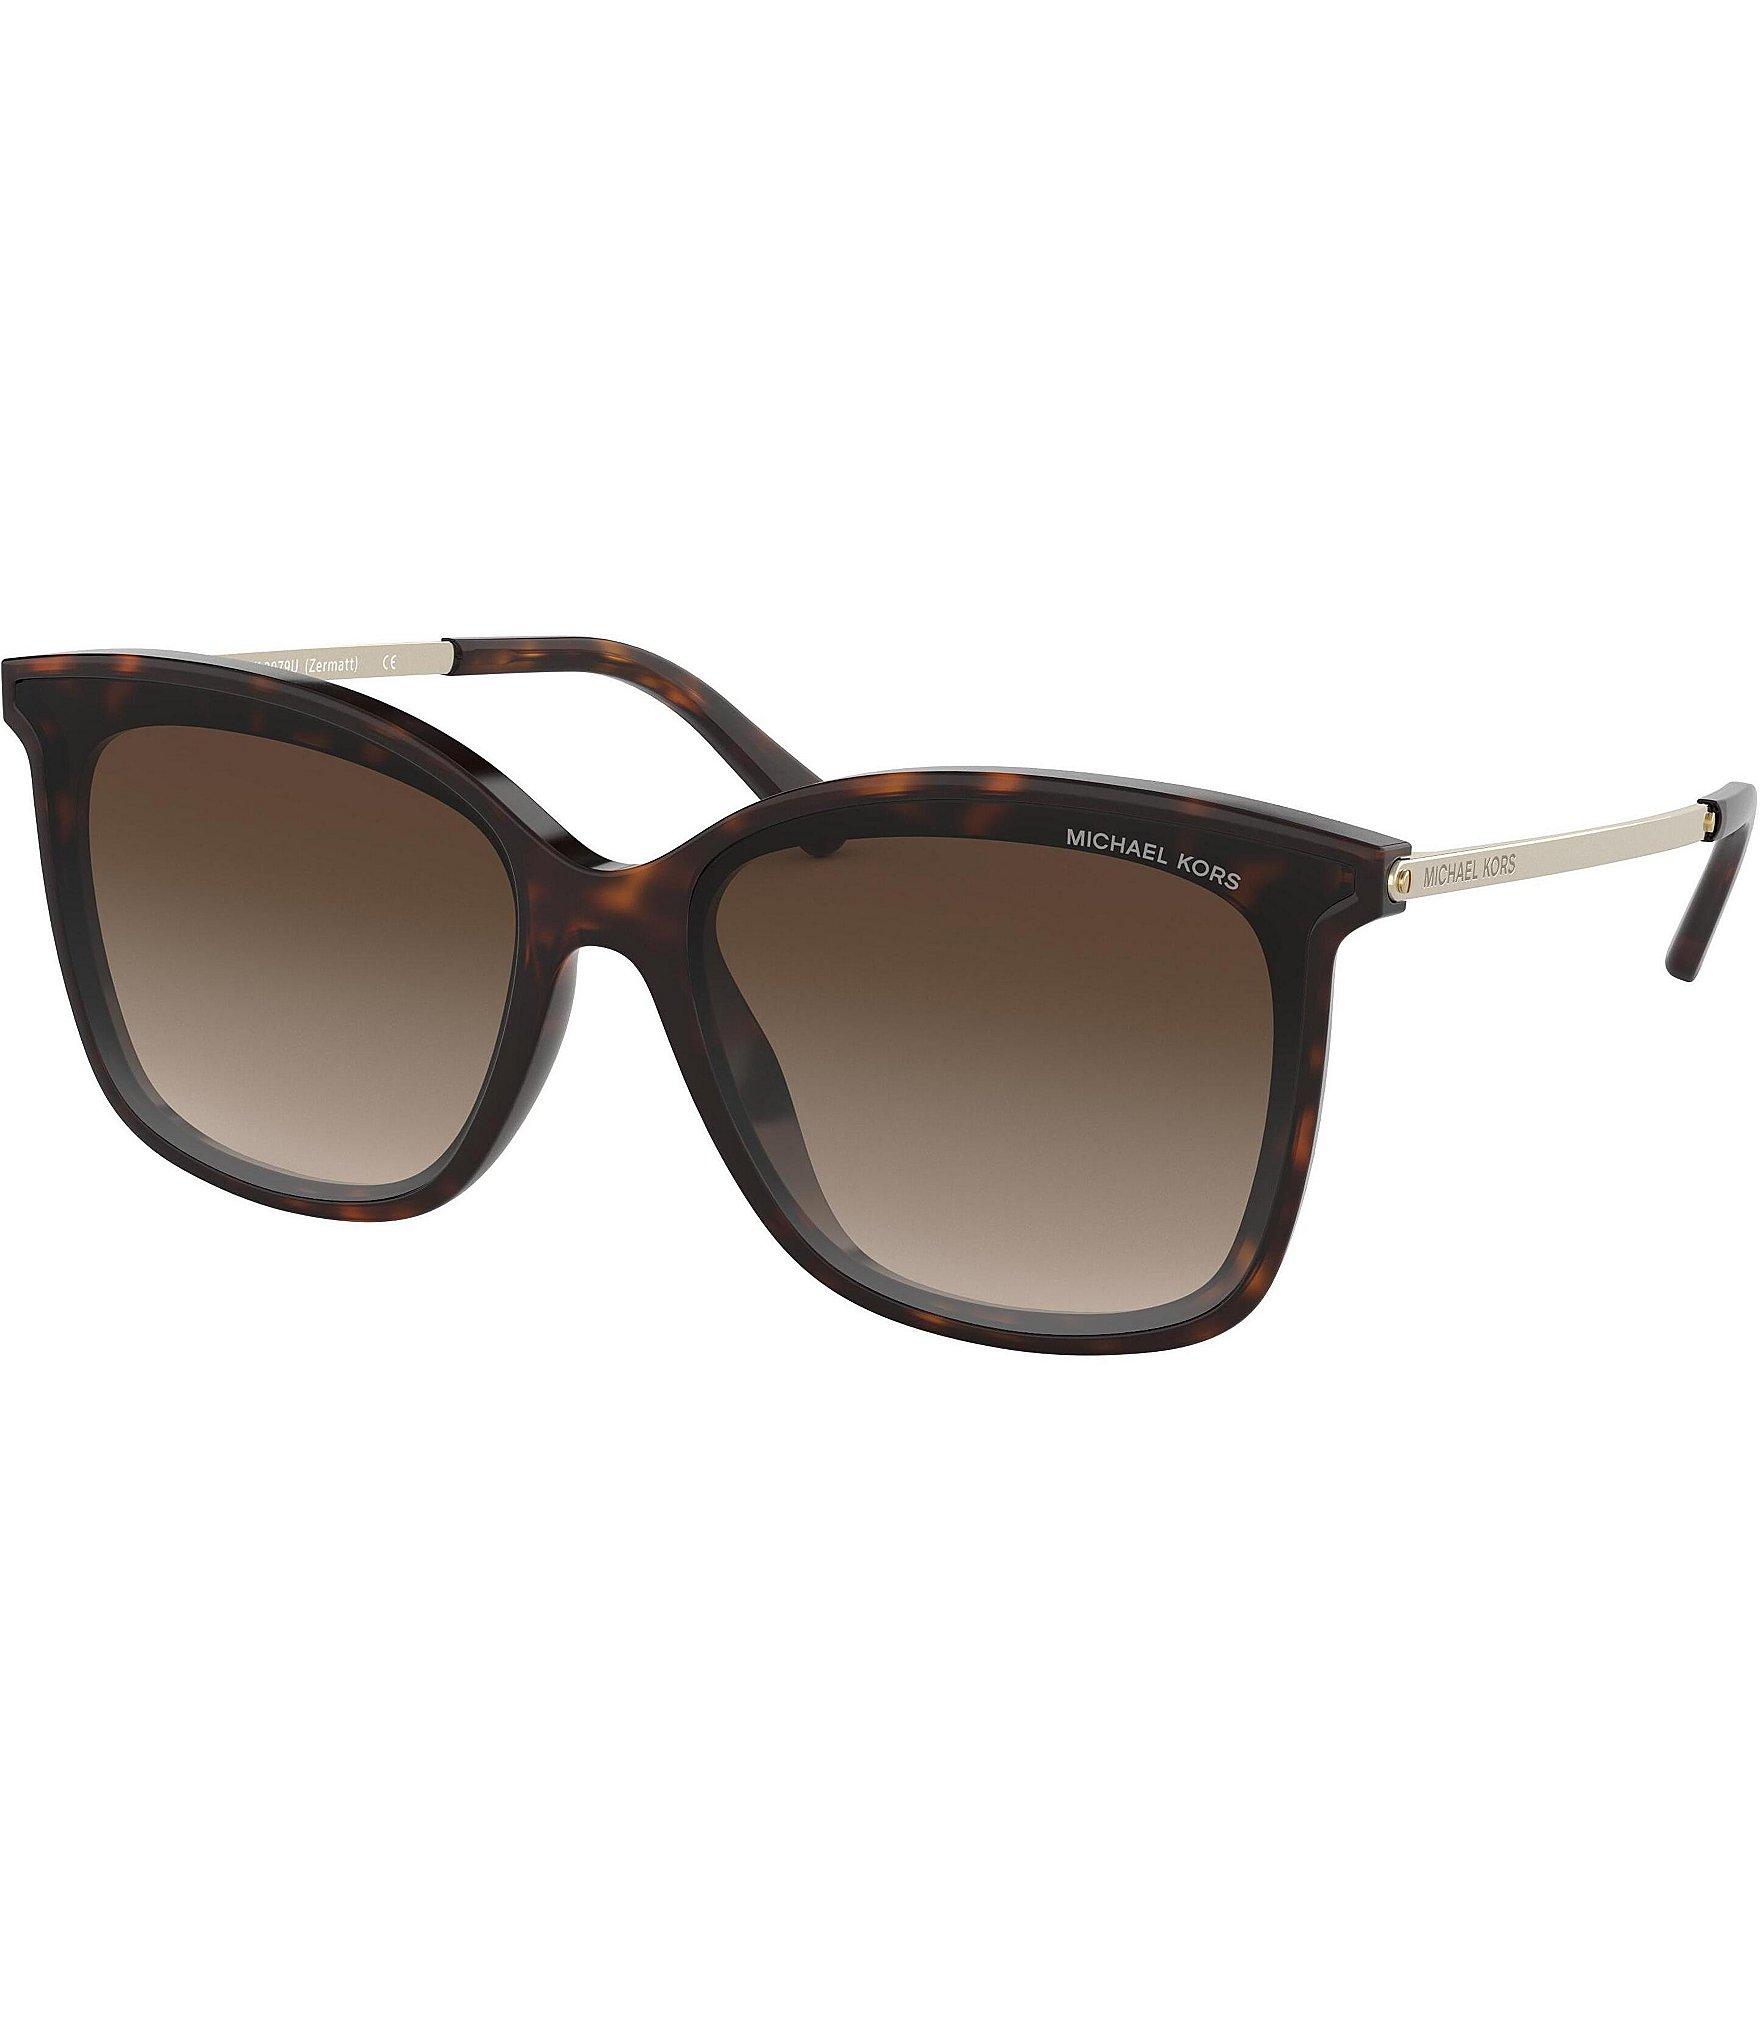 8491f2884f michael kors womens   Black Sunglasses   Eyewear